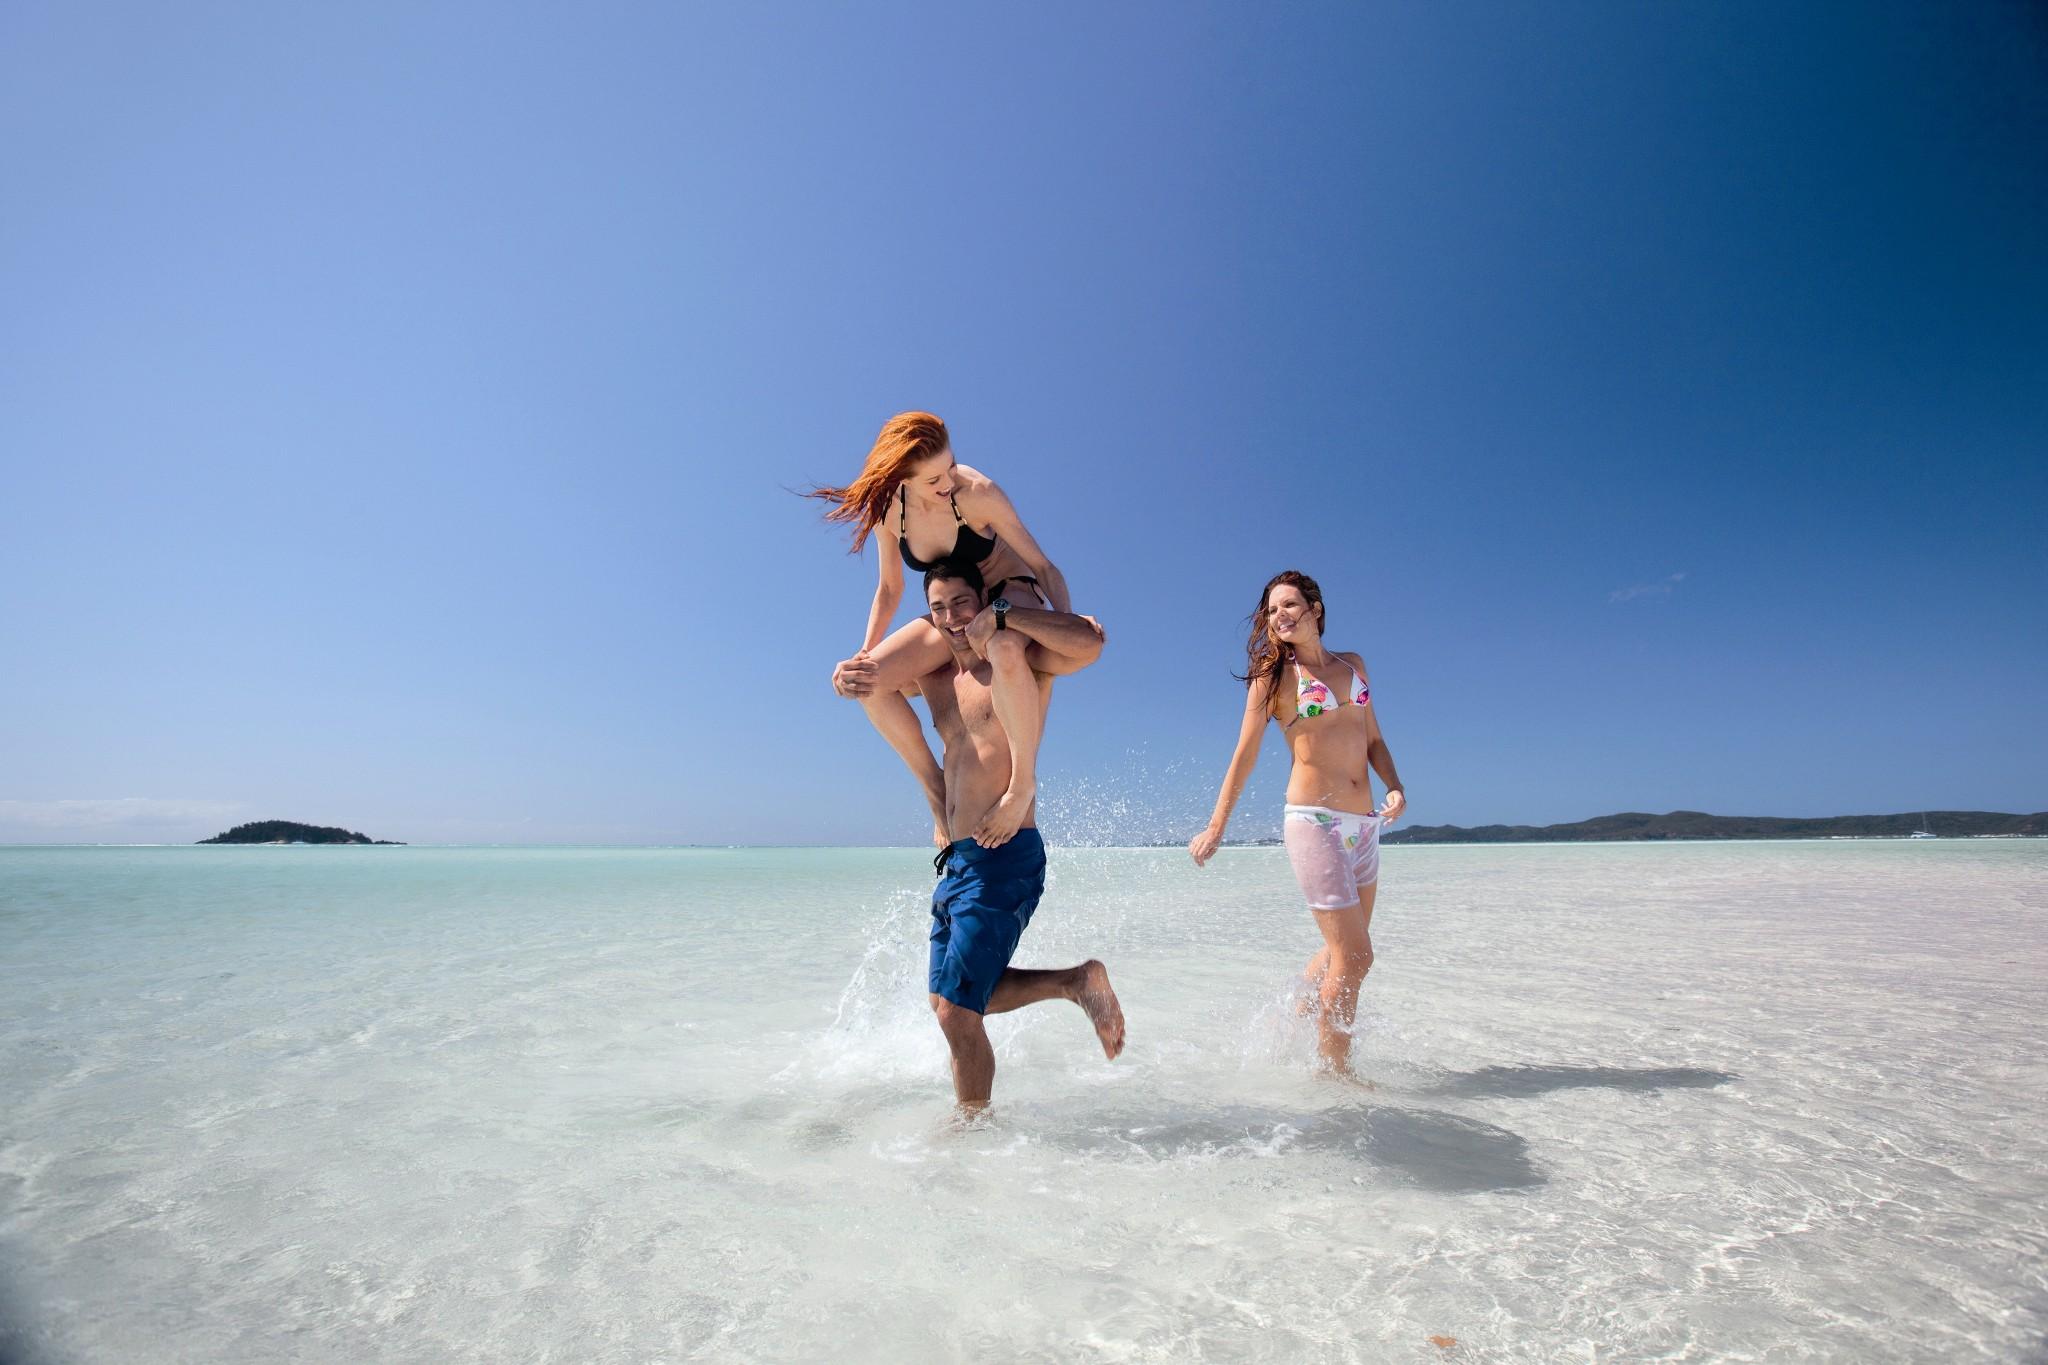 People splashing on beach one 106252-688 A